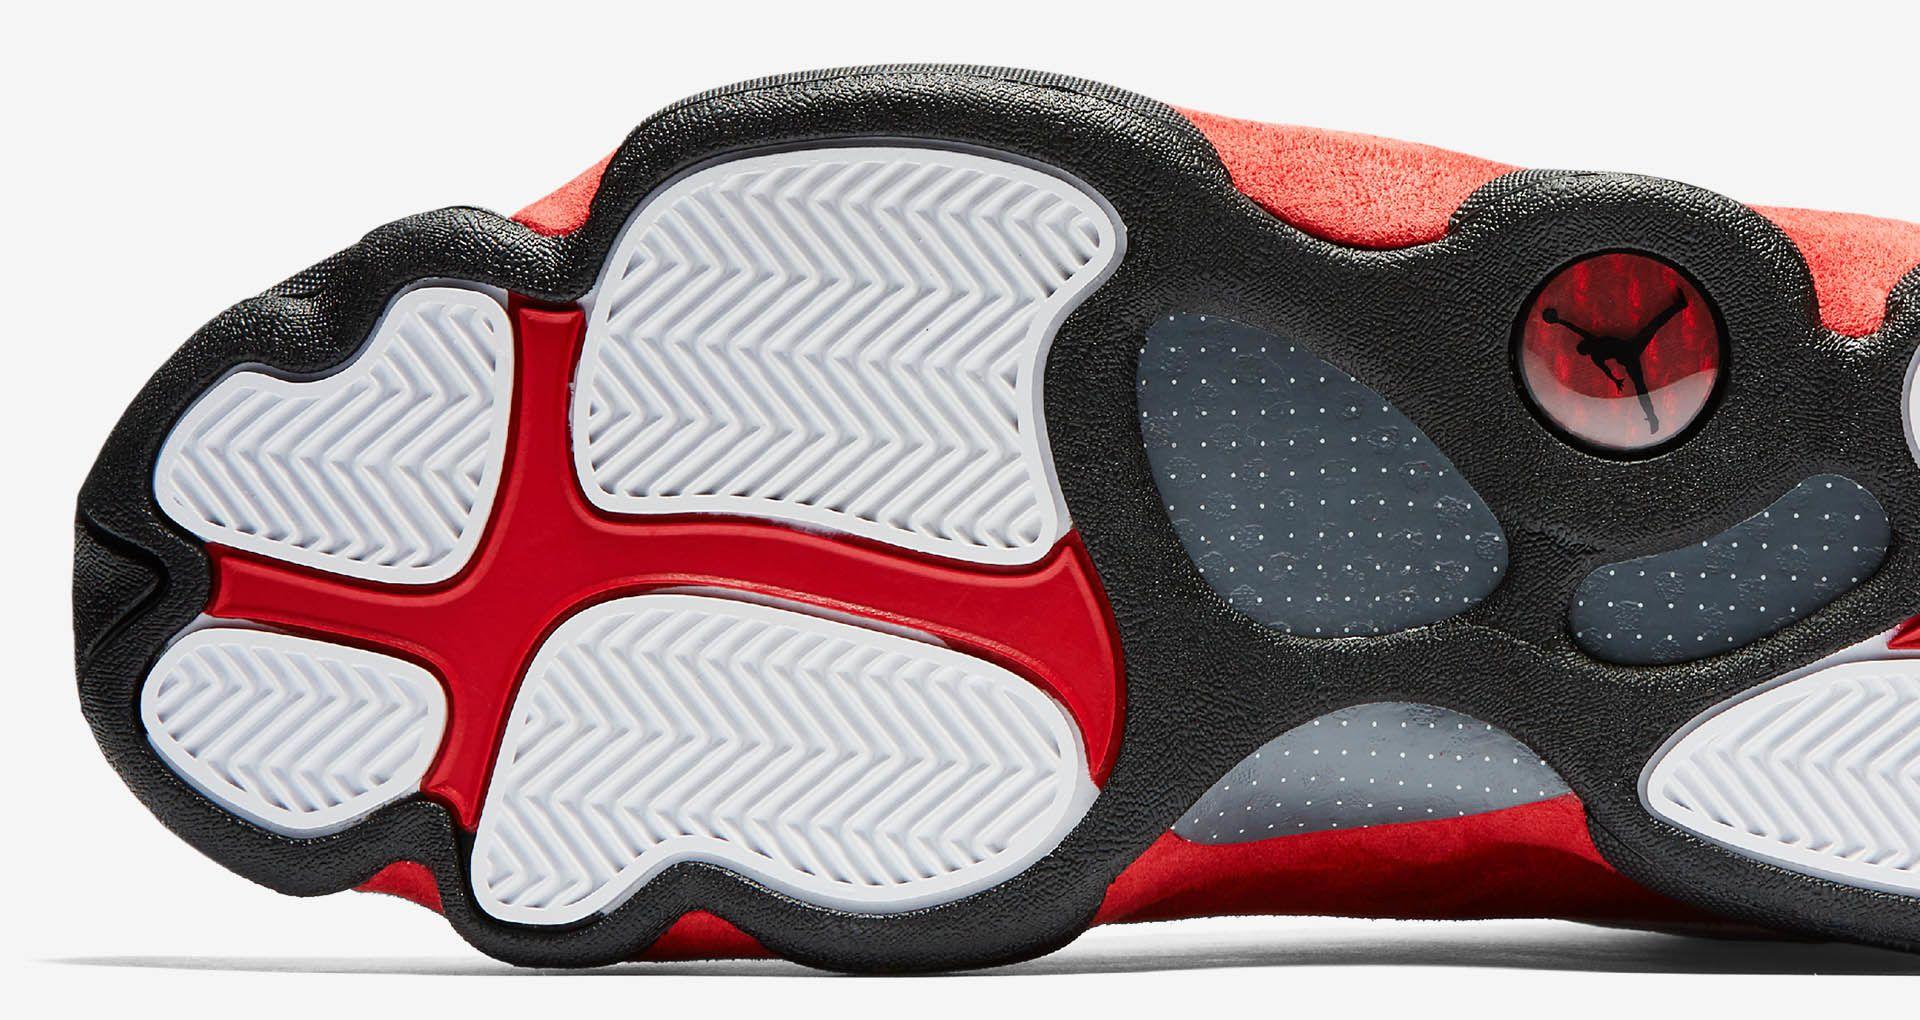 premium selection c606b daec1 Air Jordan 13 Retro OG 'White & Team Red'. Nike+ Launch GB